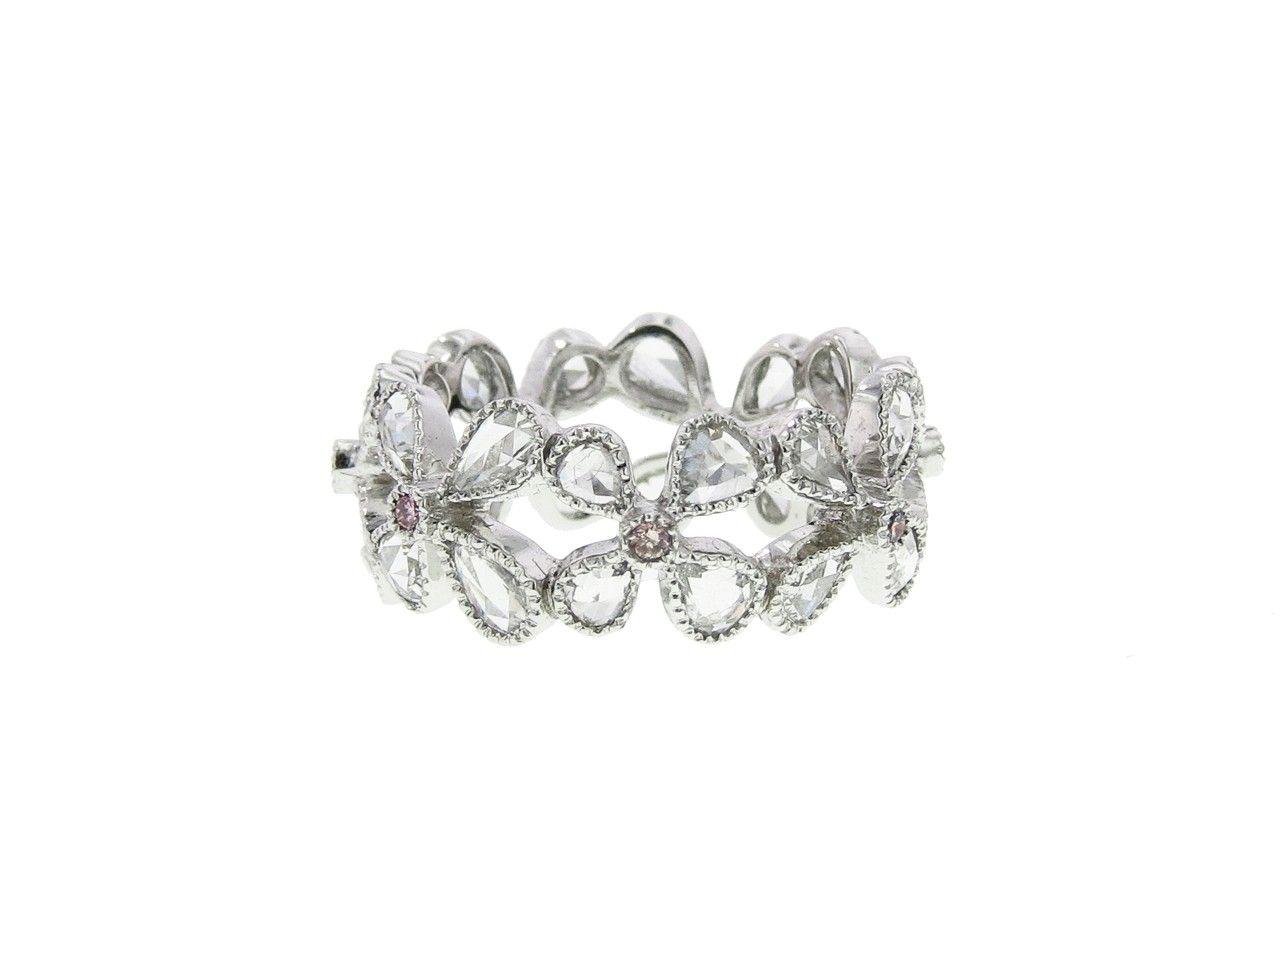 Wide Rose Cut Diamond Petal Ring   by Sethi Couture, at Ylang | 23